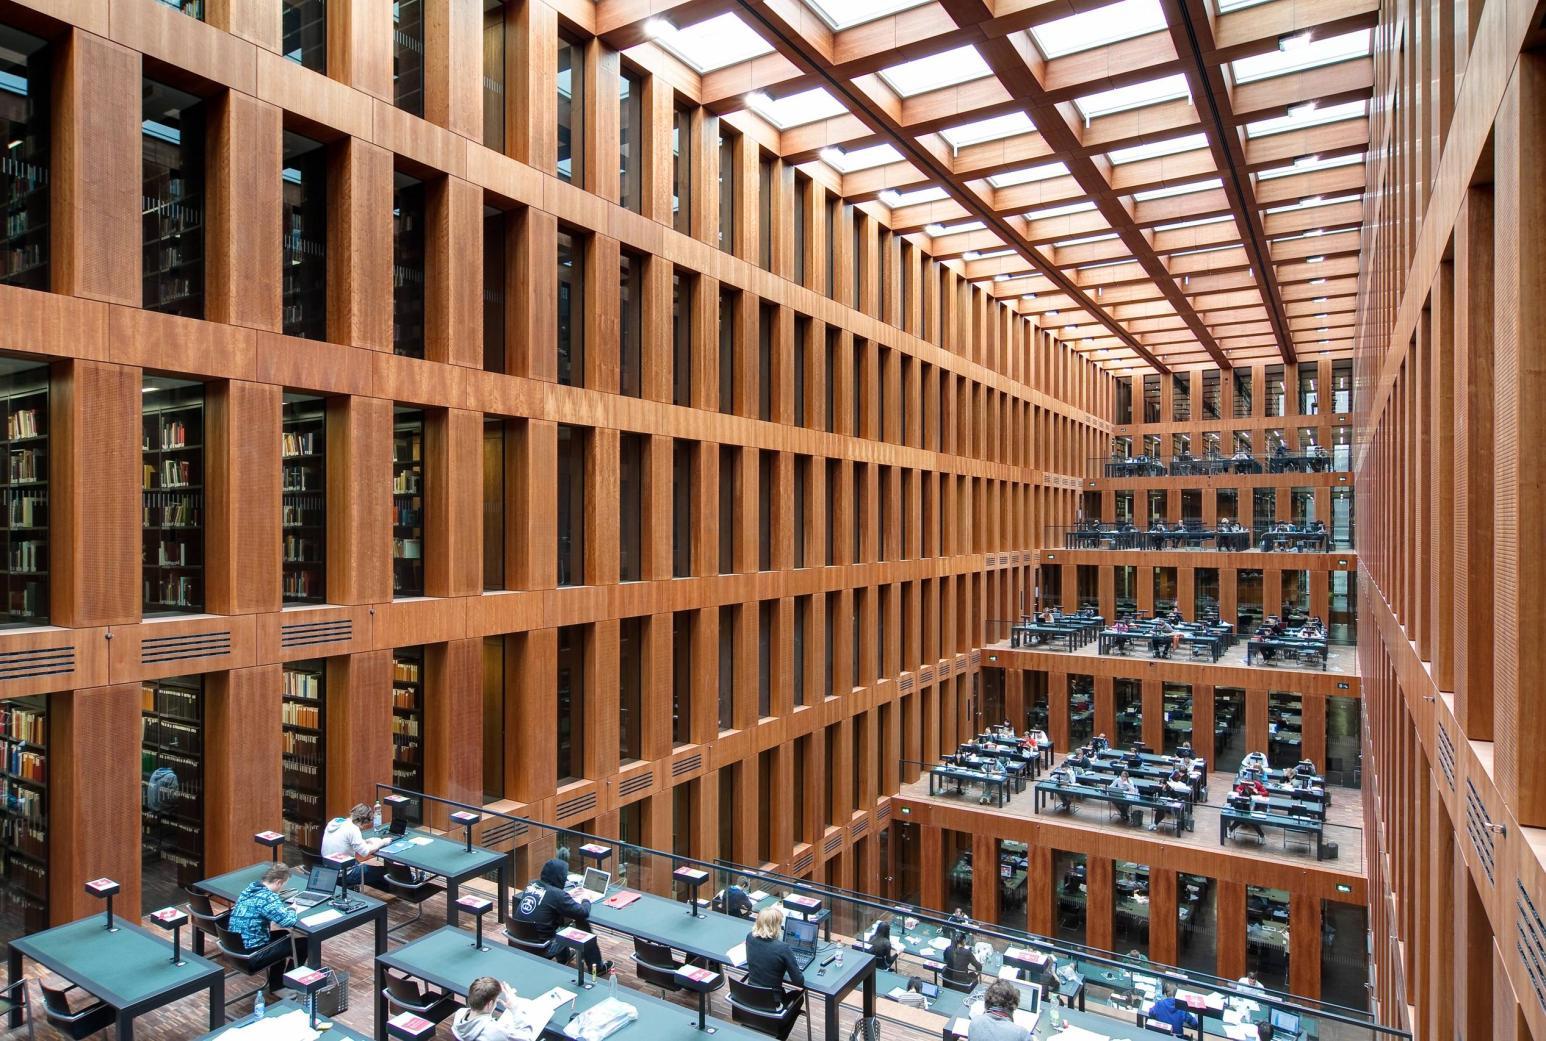 Library of Humboldt University Berlin 5066x3413